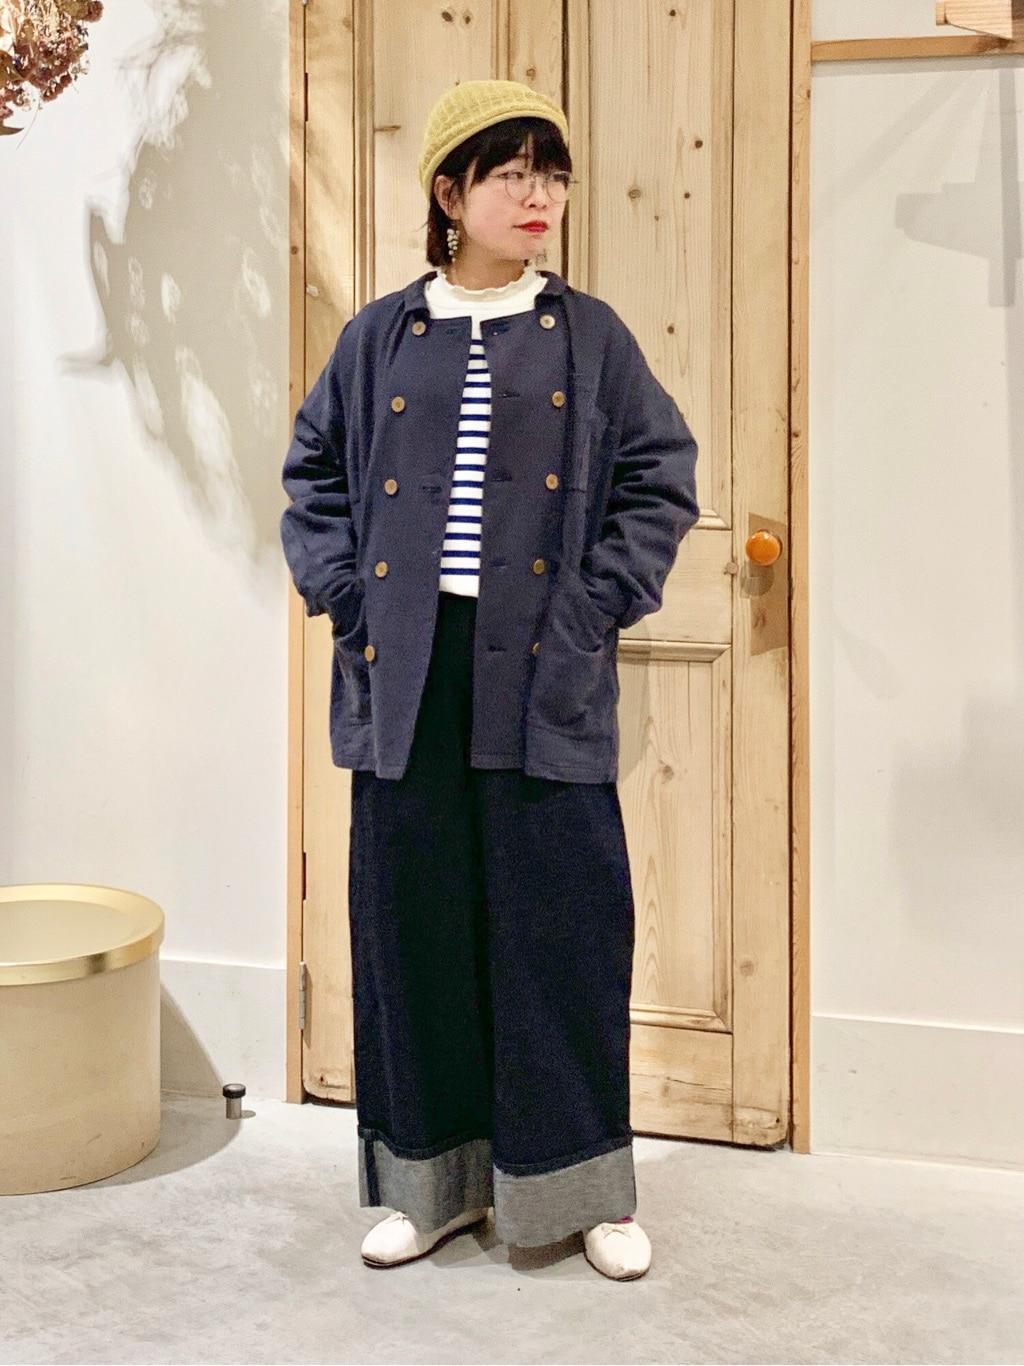 Malle chambre de charme 調布パルコ 身長:153cm 2021.02.10